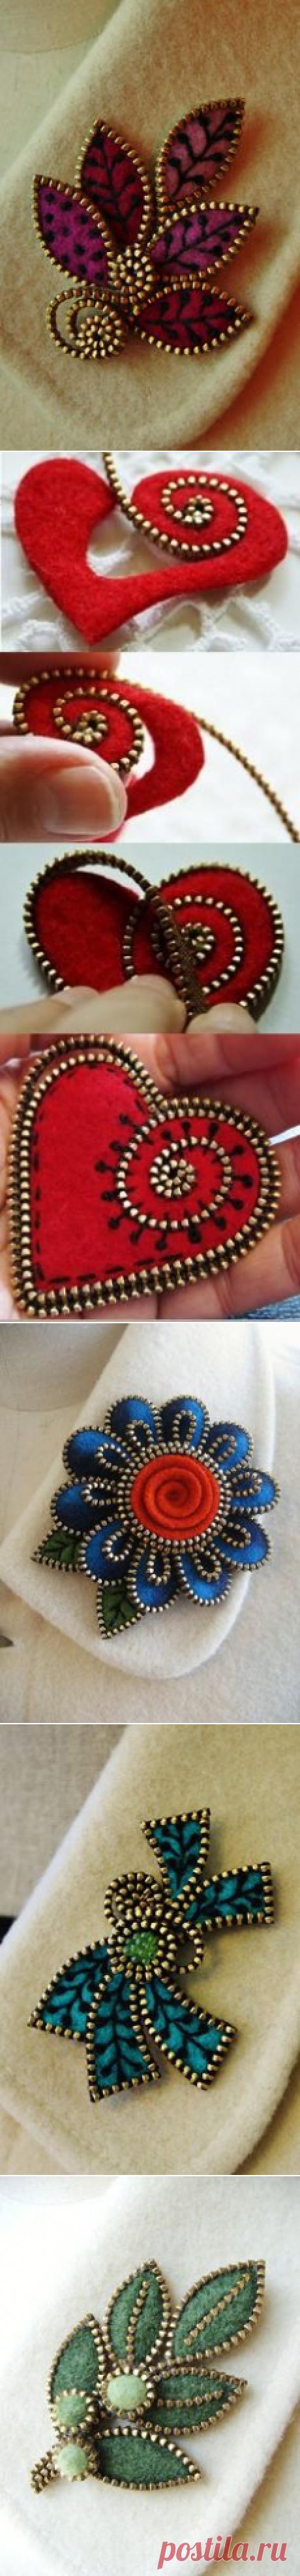 (23) felt and zipper | keçe işleri